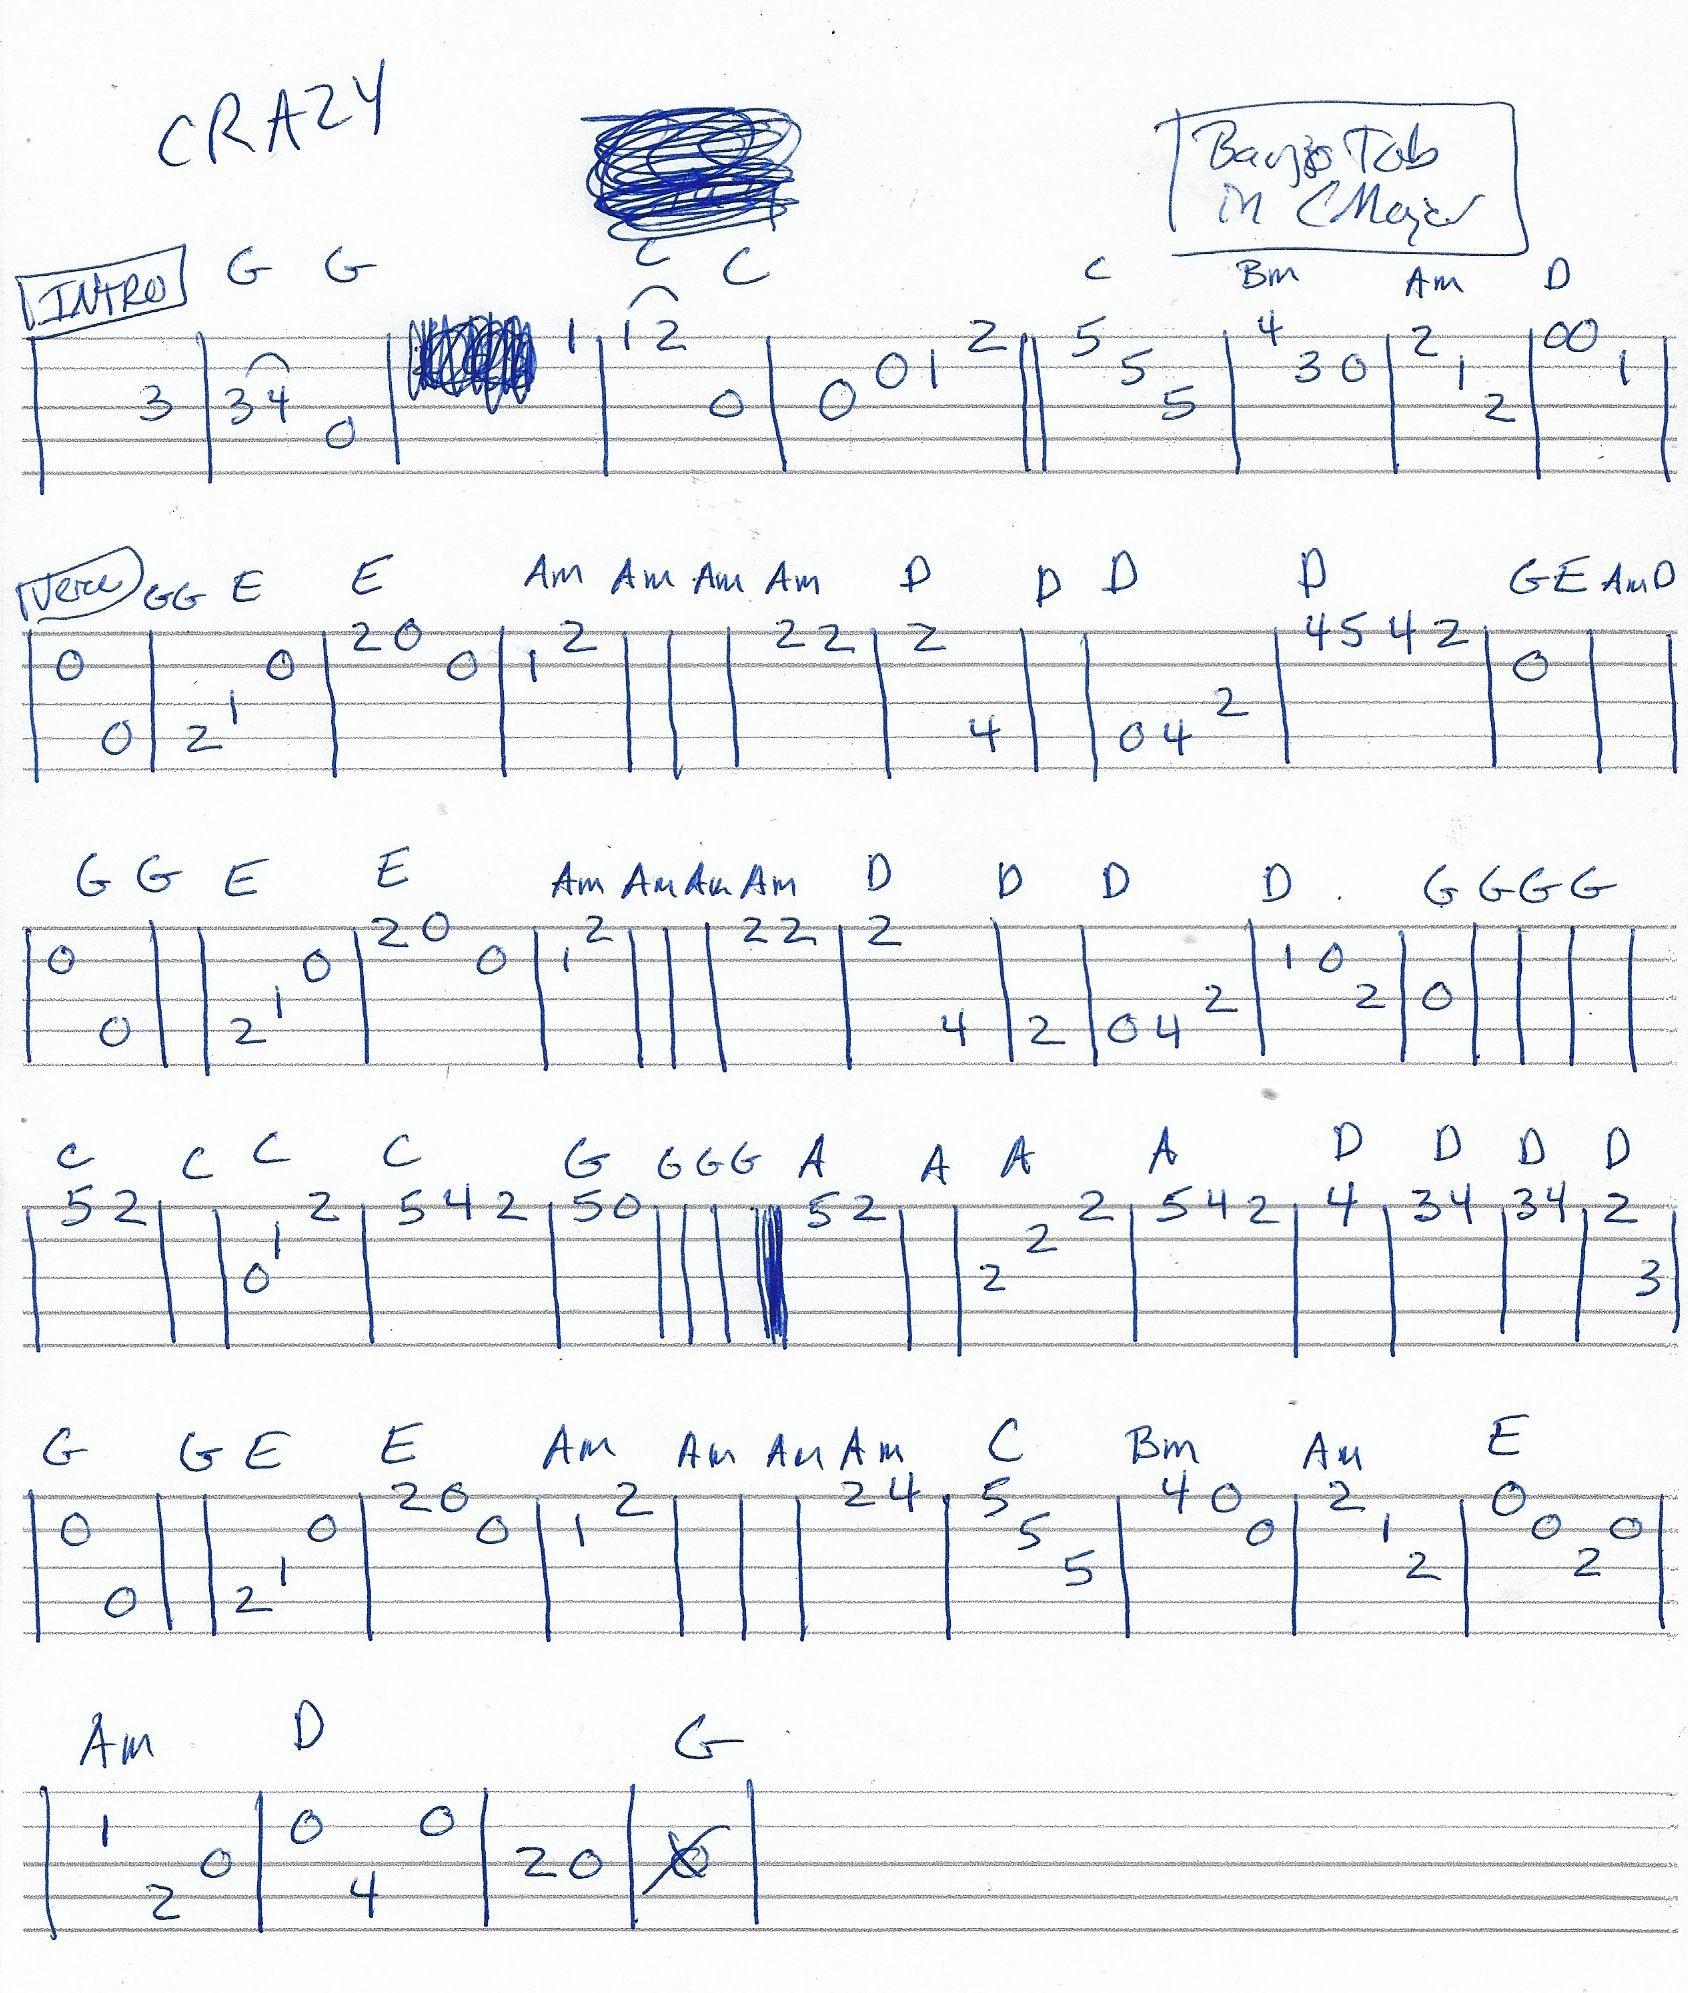 Crazy Patsy Cline Guitar Chord Chart   Banjo Melody Tab in G ...